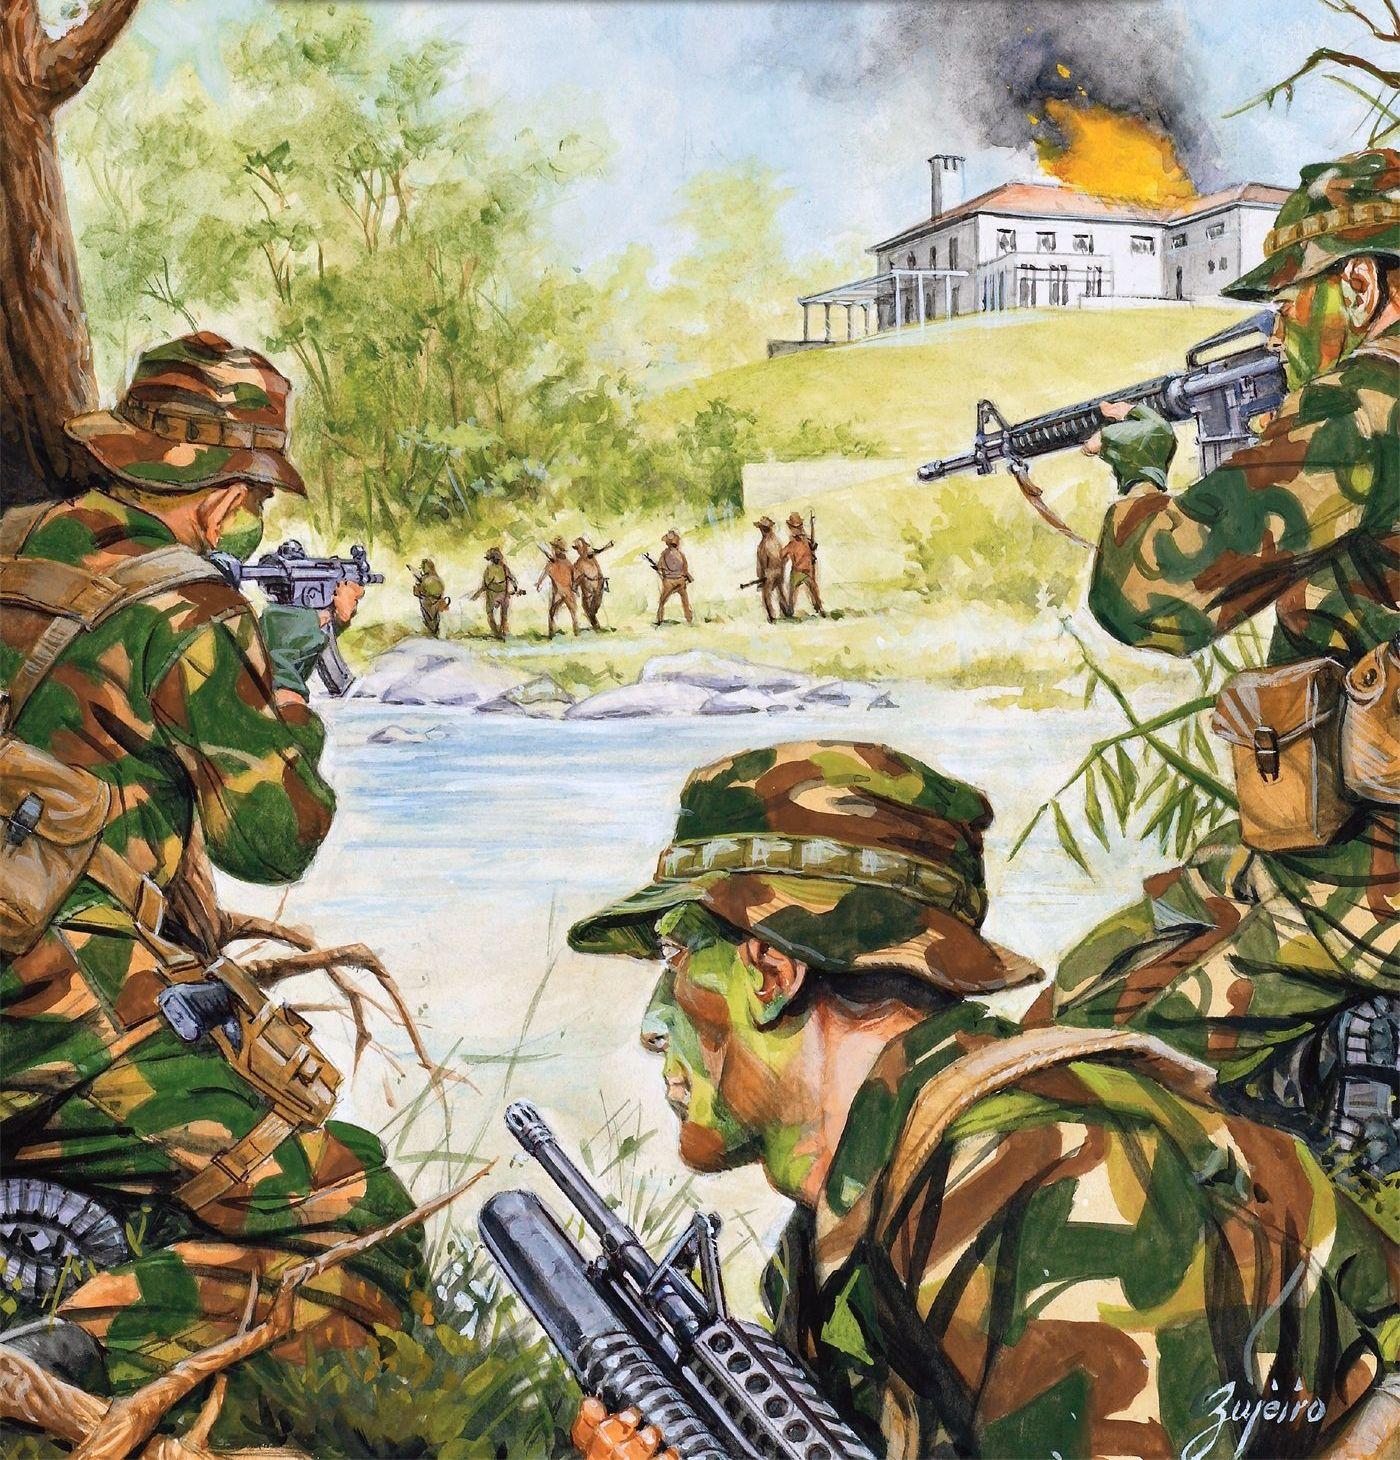 US special forces ambushing a Vietcong patrol | Vietnam War Art ...